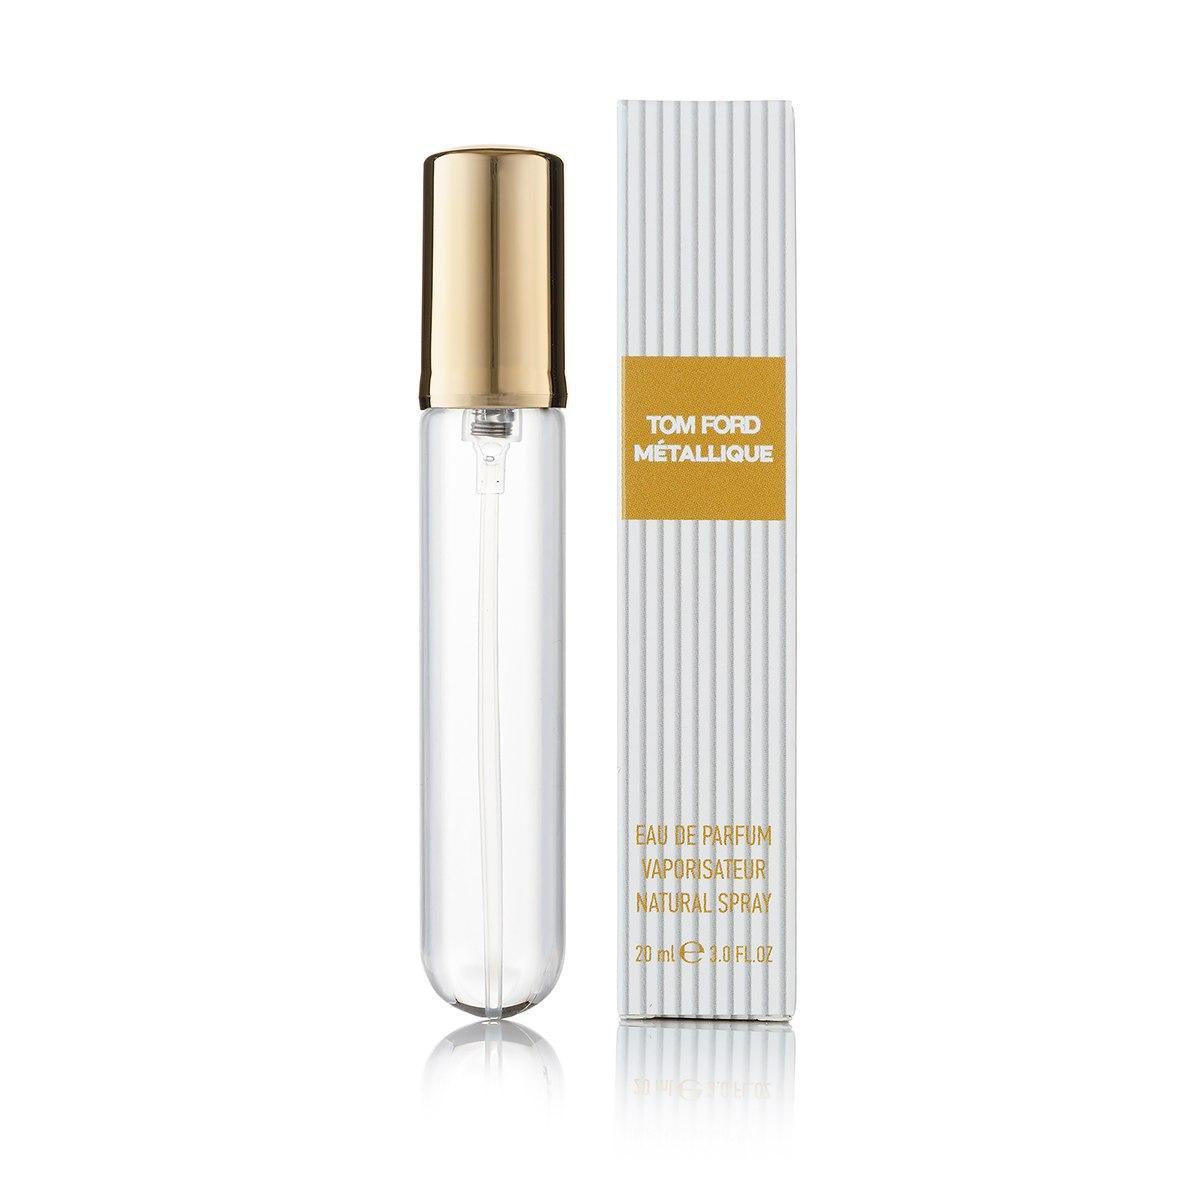 20 мл парфюм спрей Tom Ford Metallique (Ж)